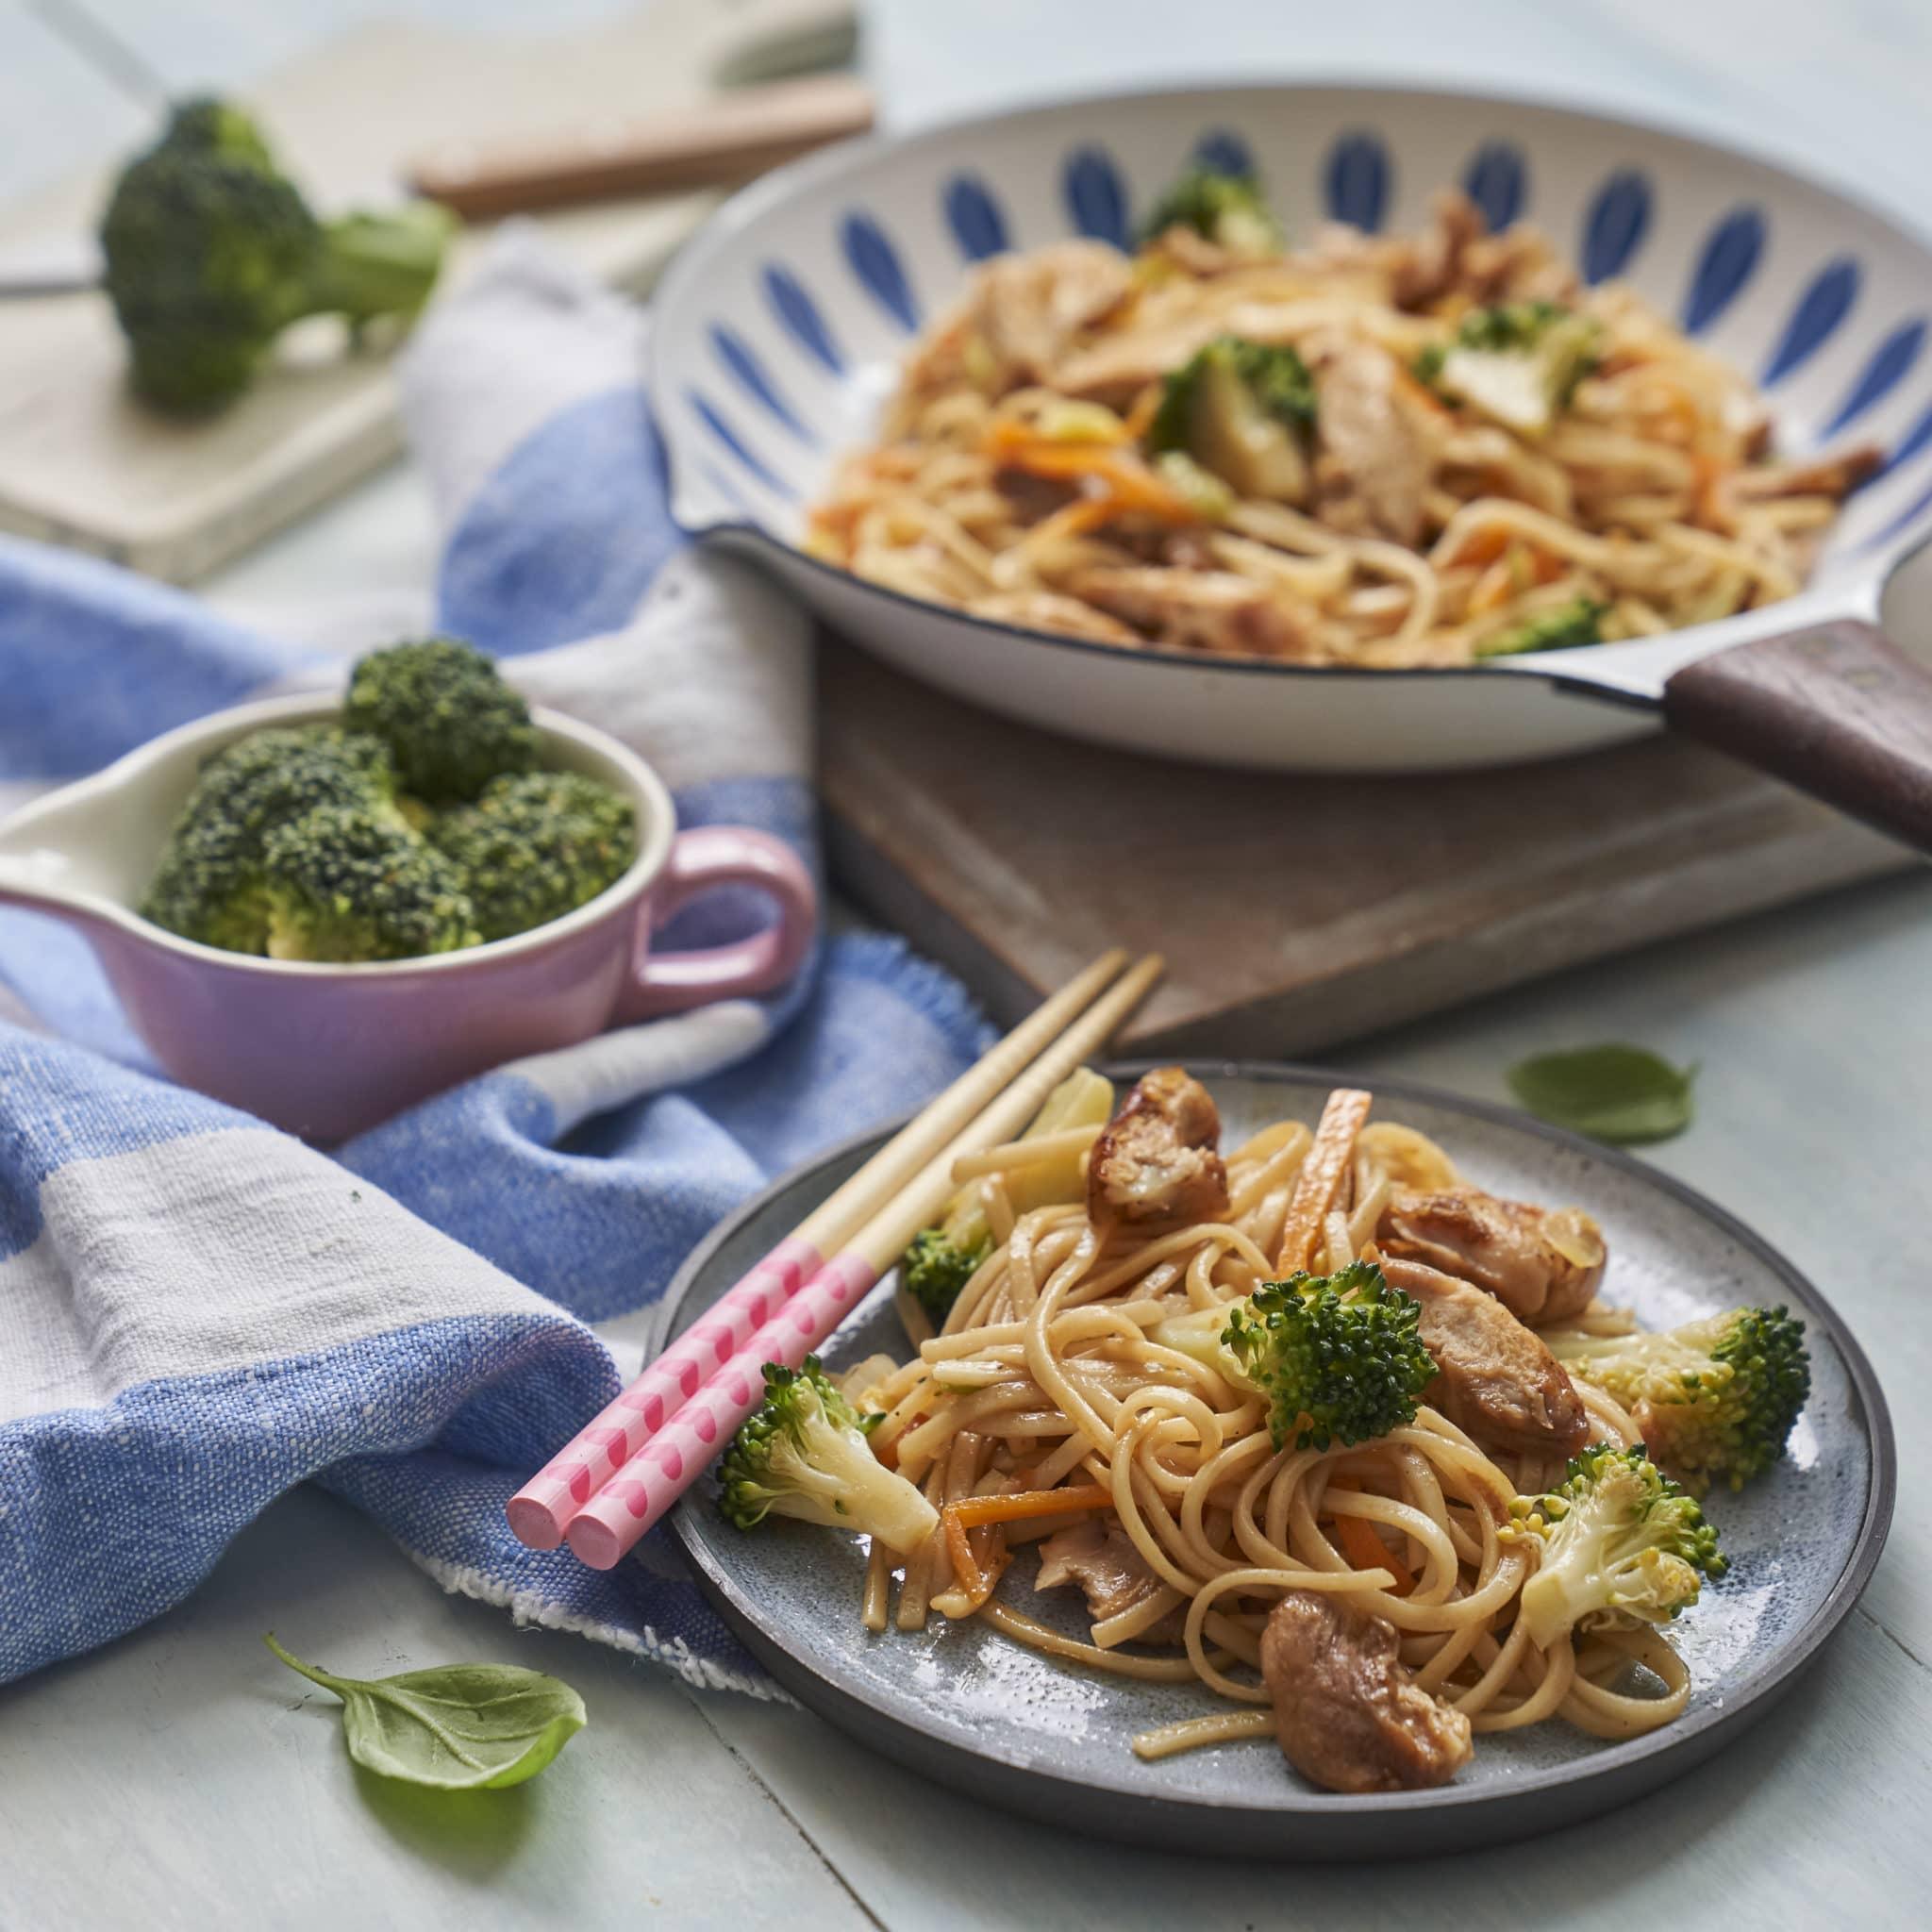 teriyaki chicken noodles recipe by Annabel Karmel